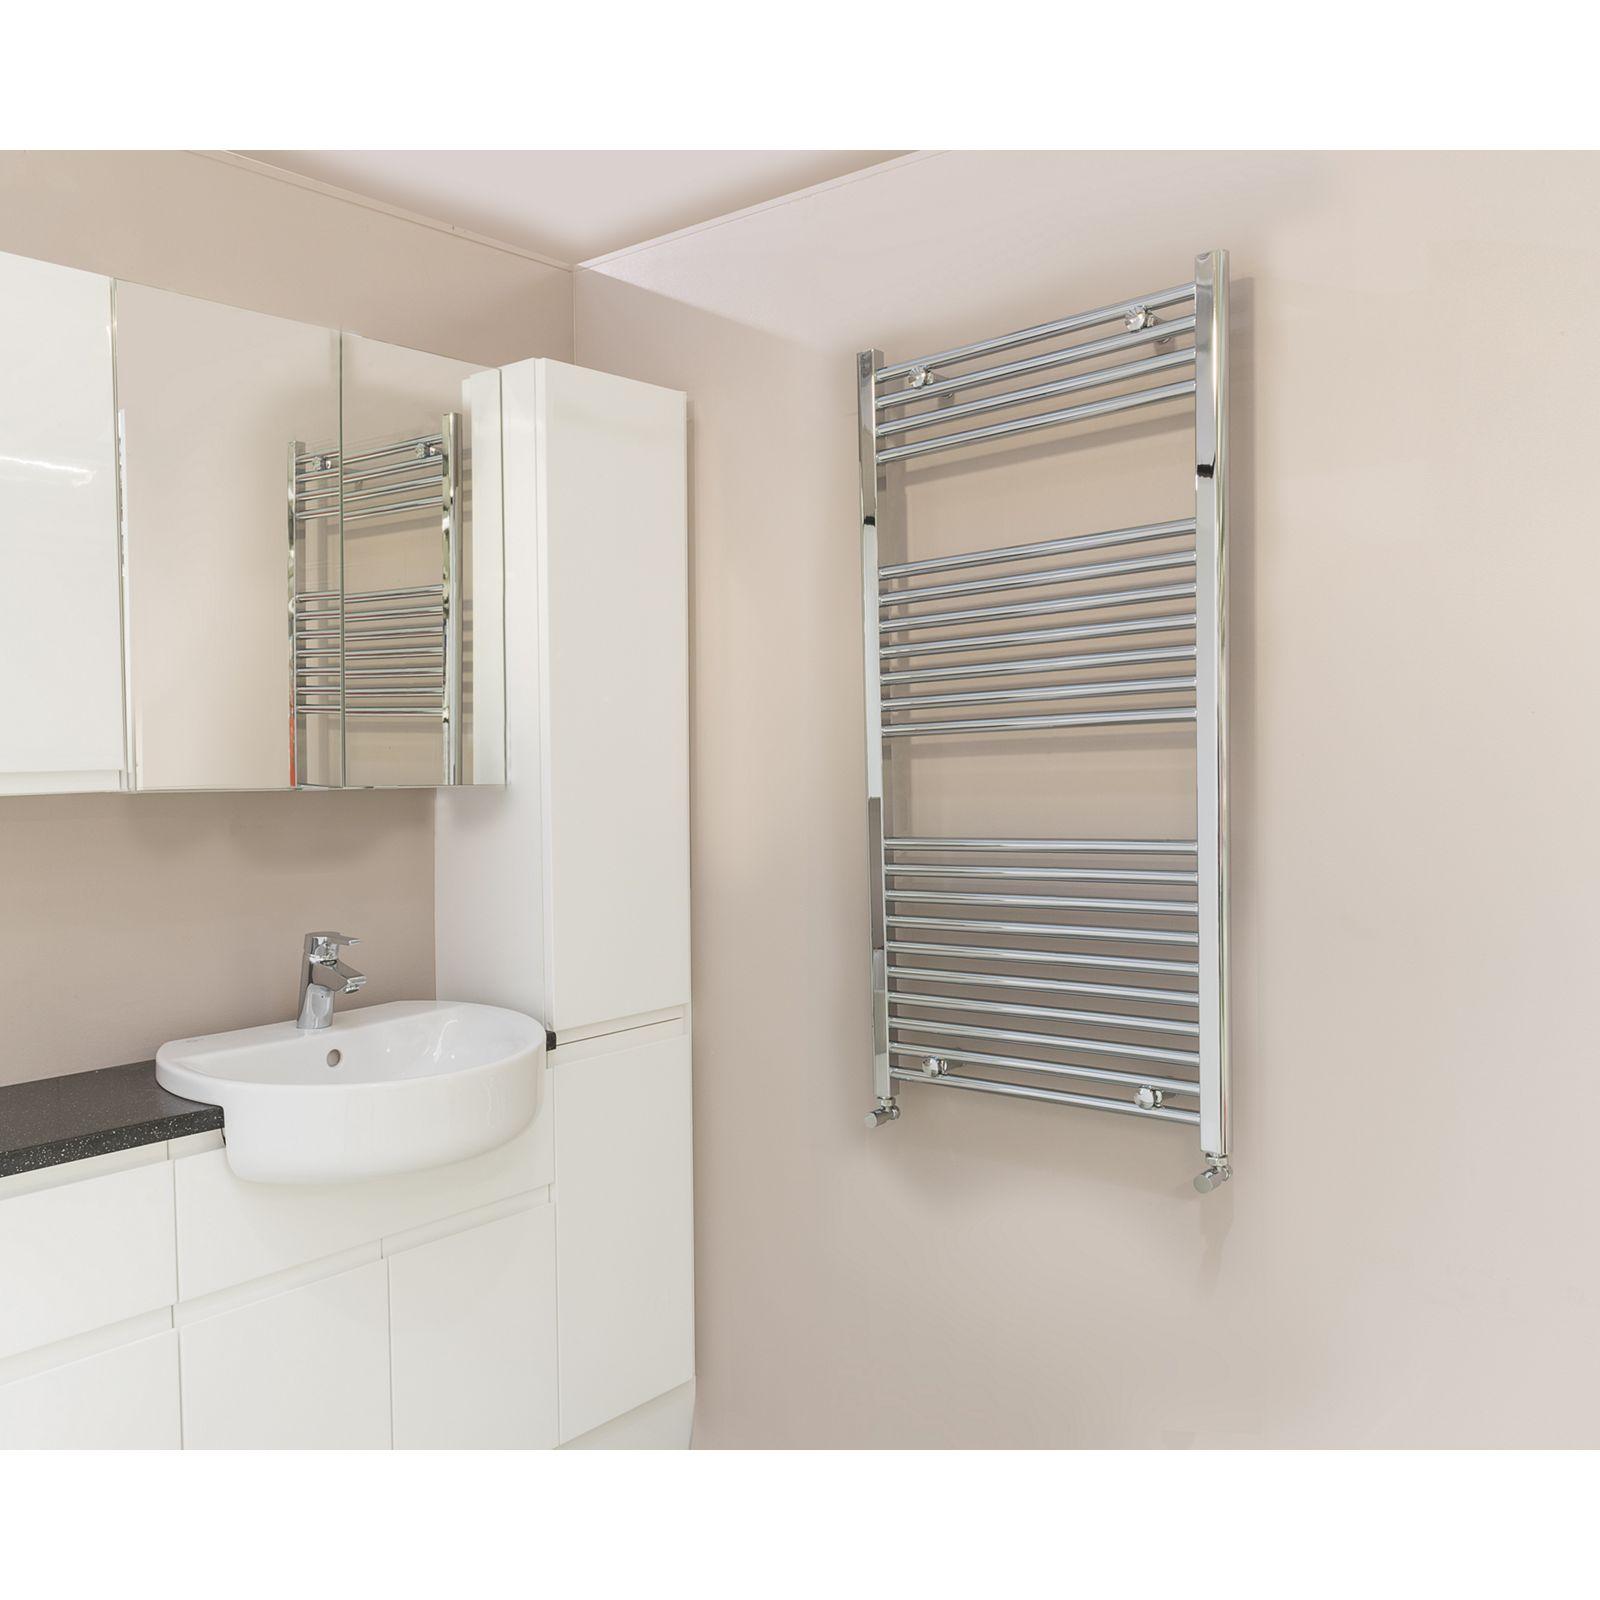 Qual-Rad Heated Towel Rail / Warmer / Radiator – Central Heating 6